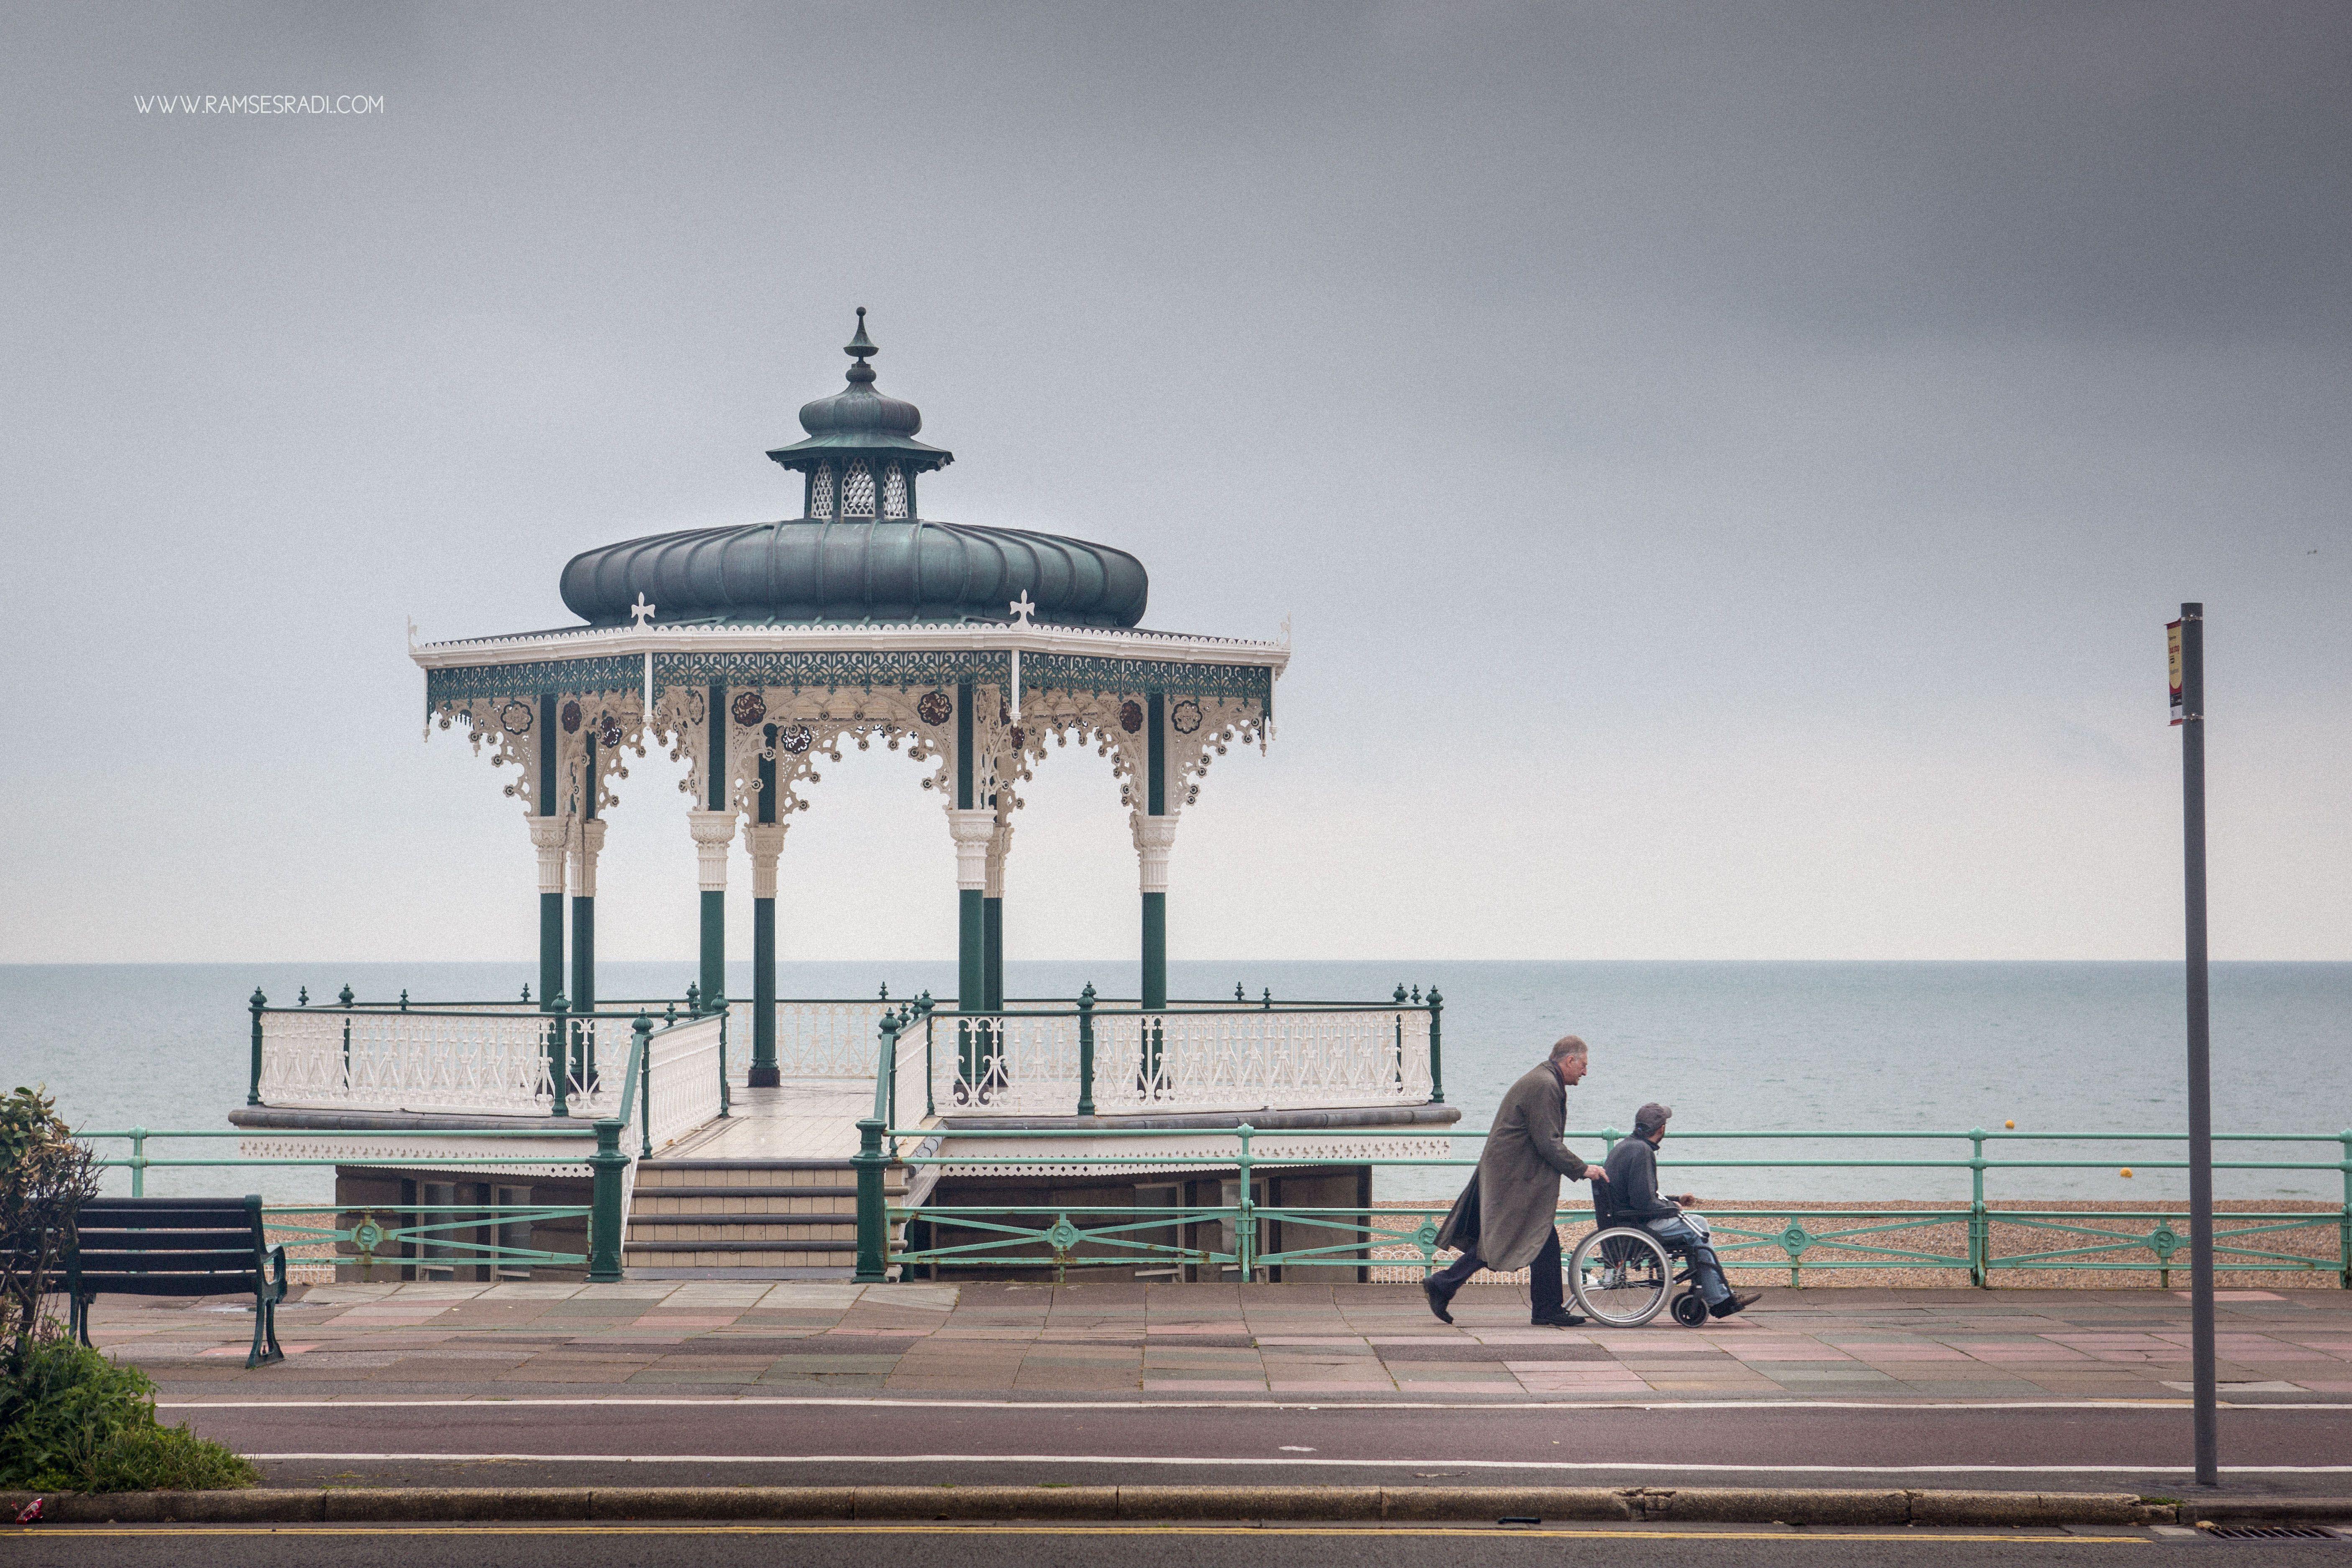 Brighton Seafront by Ramses Radi www.ramsesradi.com #landscape #photography #Brighton